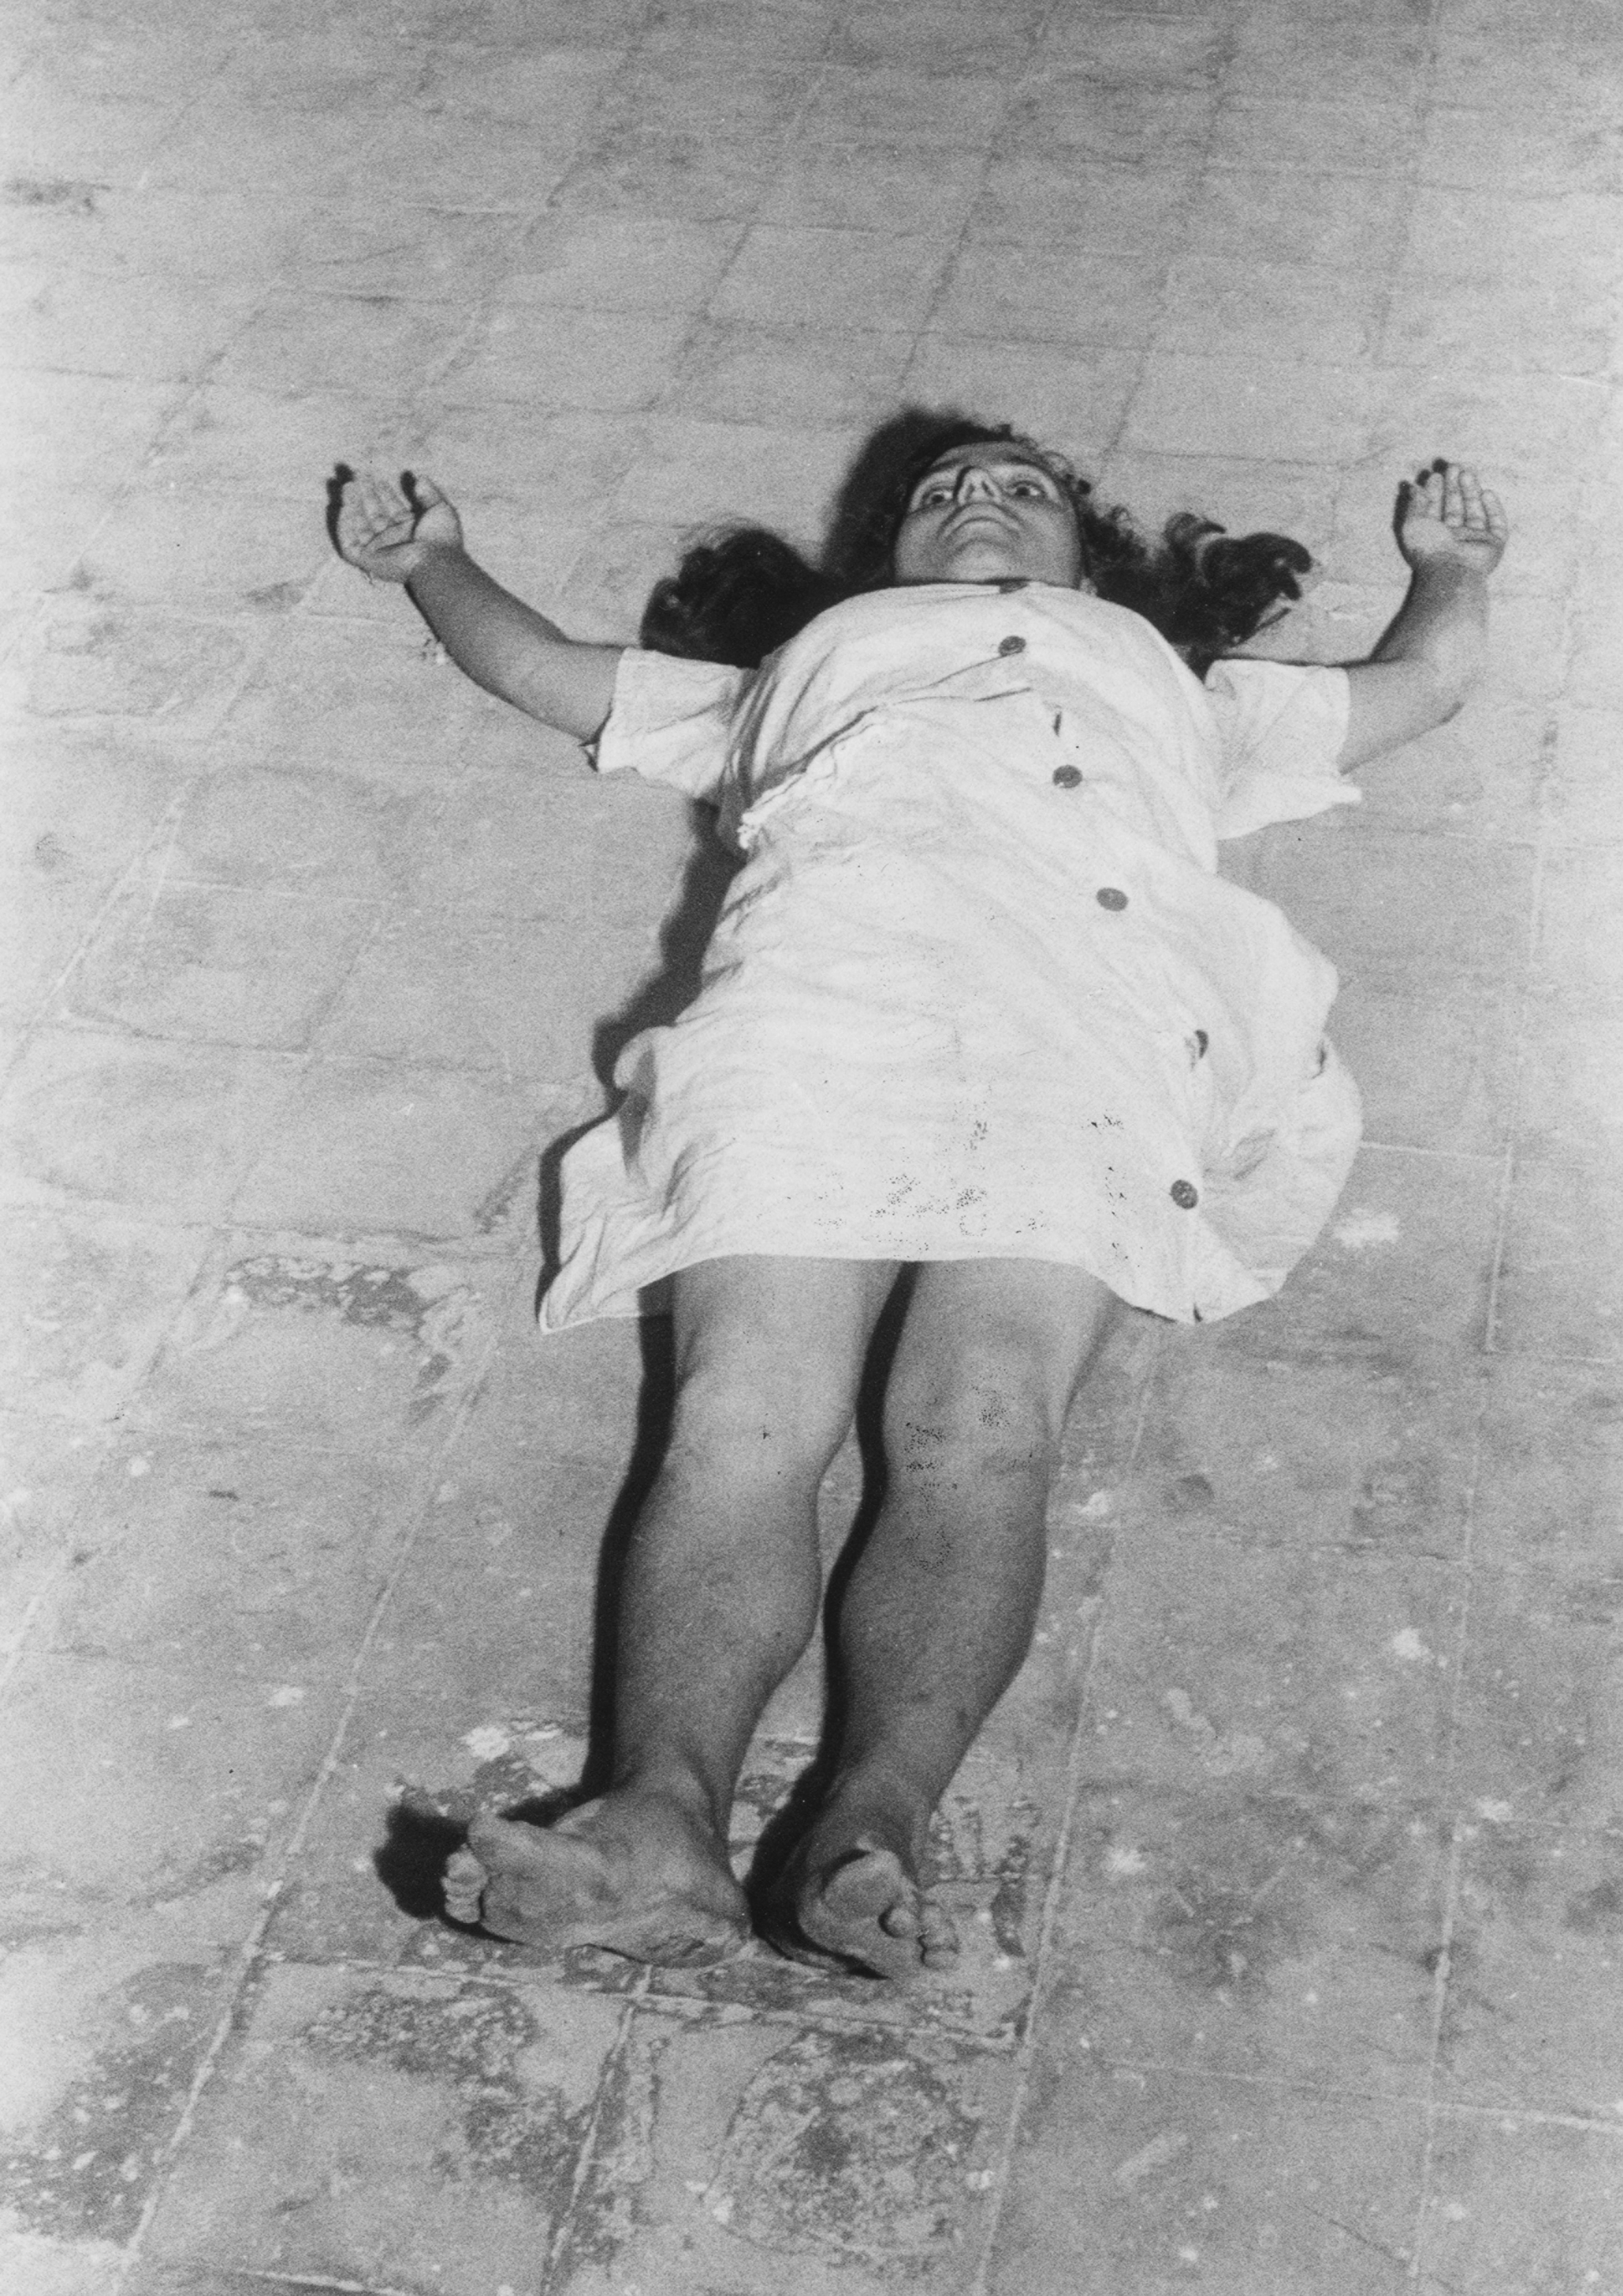 Chiara Samugheo, Le invasate, Galatina, 1954.